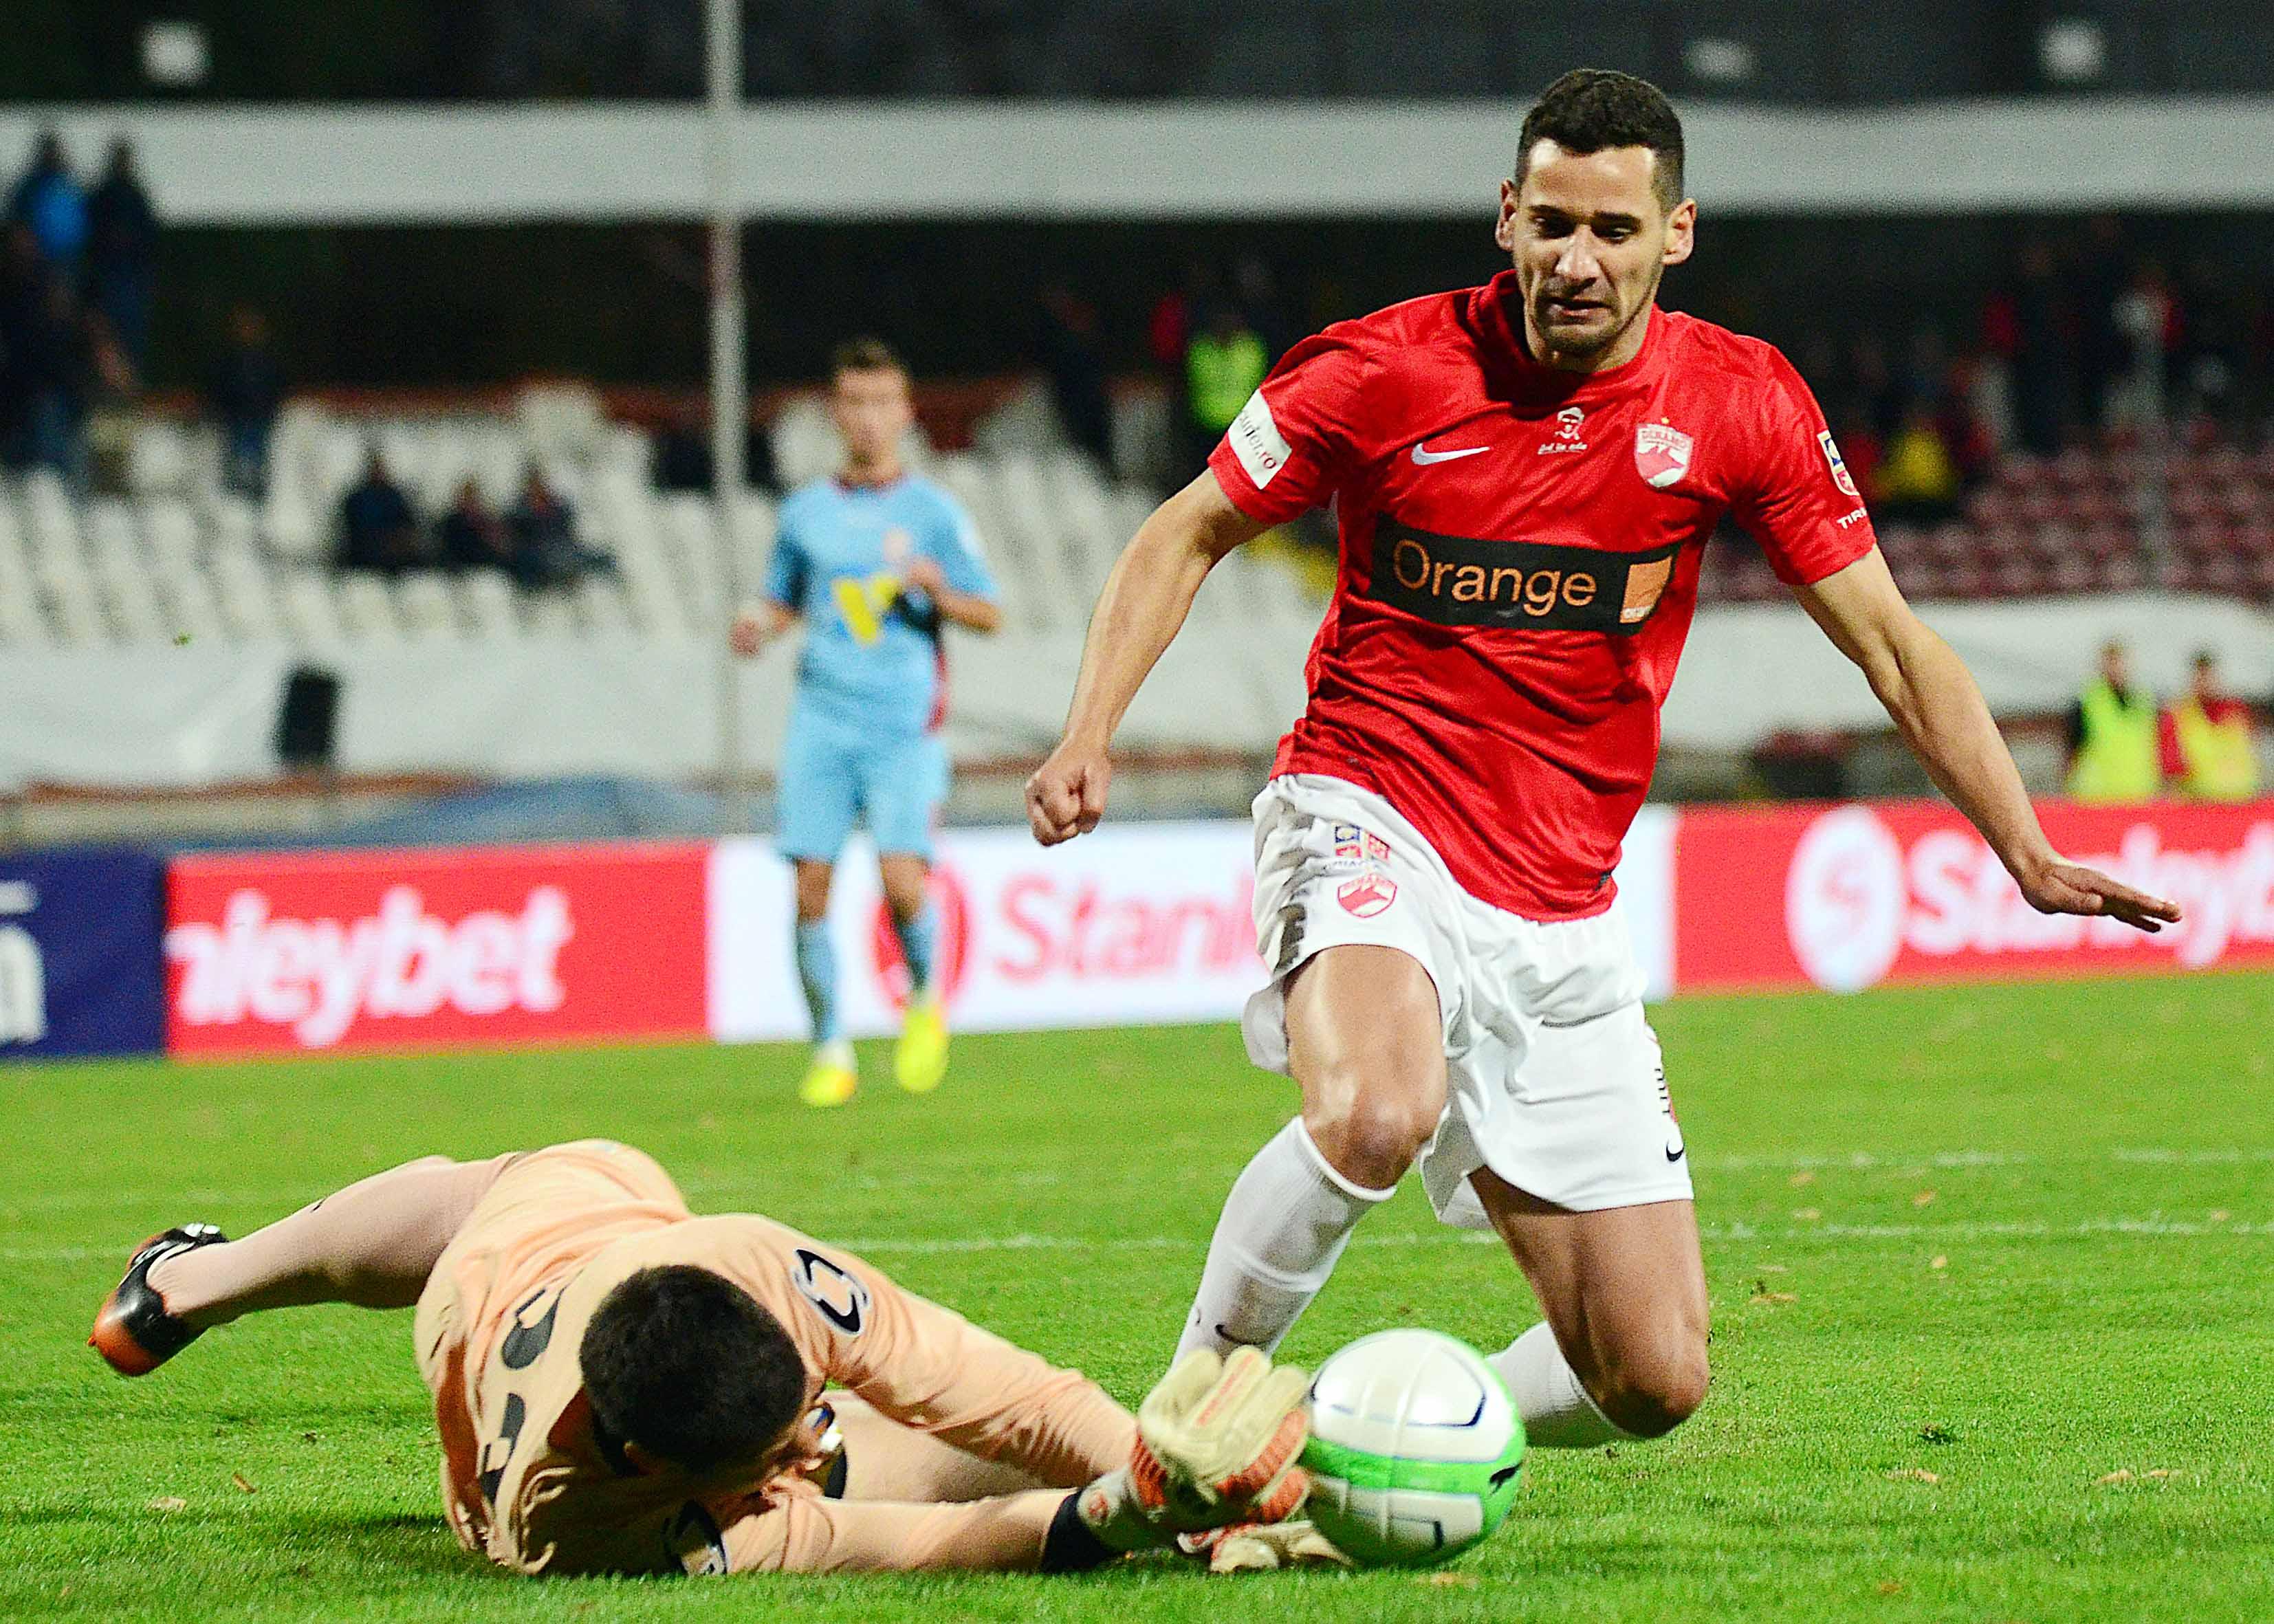 1.FOTBAL:DINAMO BUCURESTI-CHINDIA TARGOVISTE 5-0,CUPA ROMANIEI TIMISOREANA (31.10.2013)